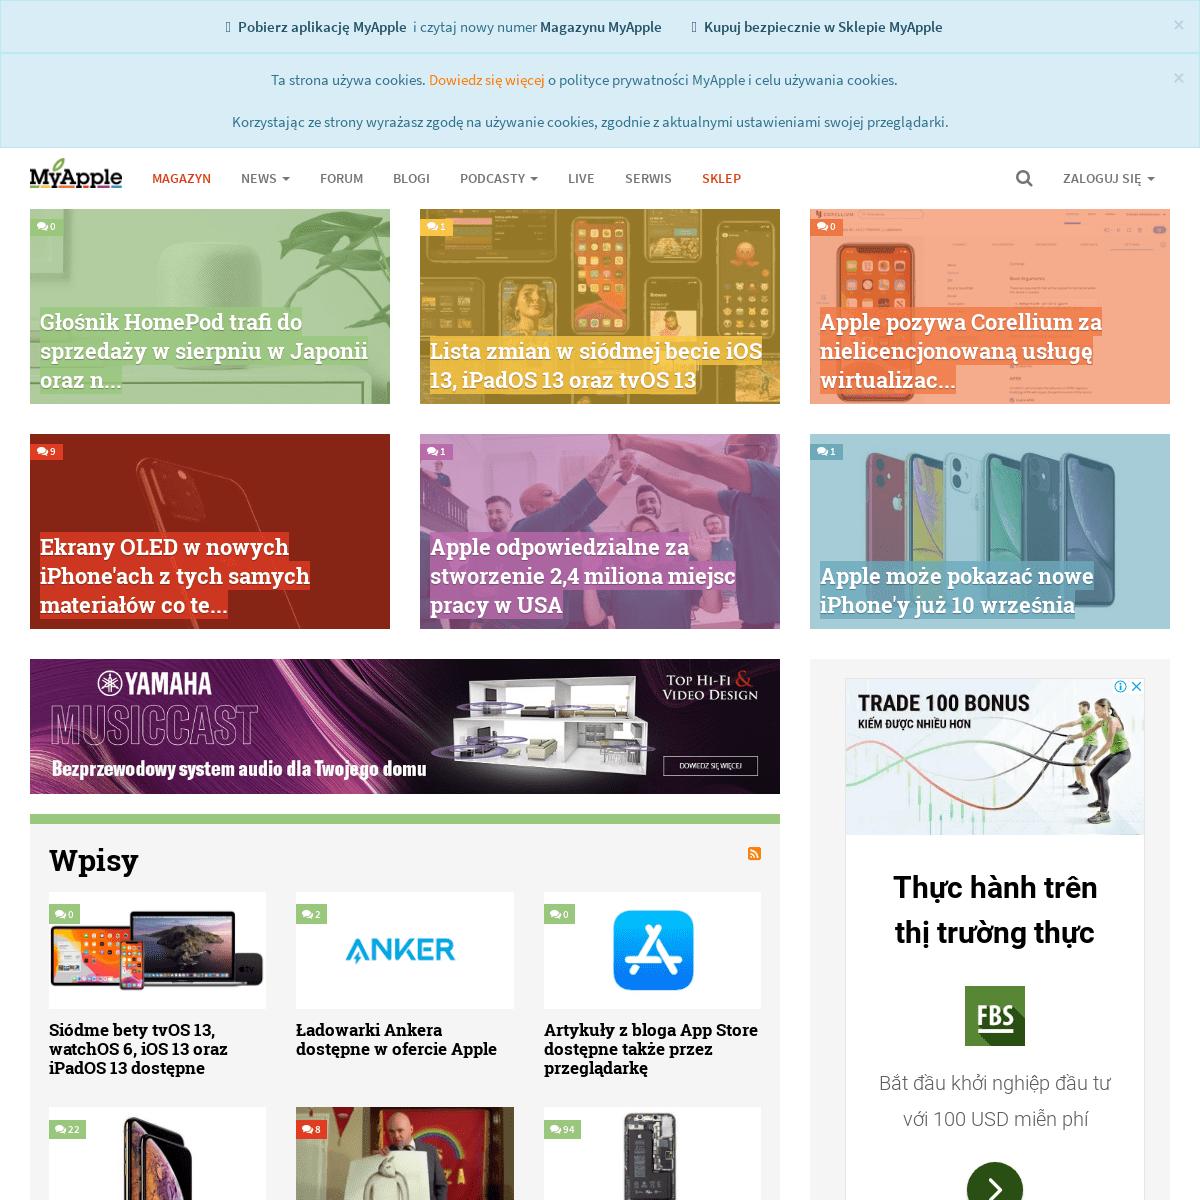 ArchiveBay.com - myapple.pl - Strona główna - MyApple.pl